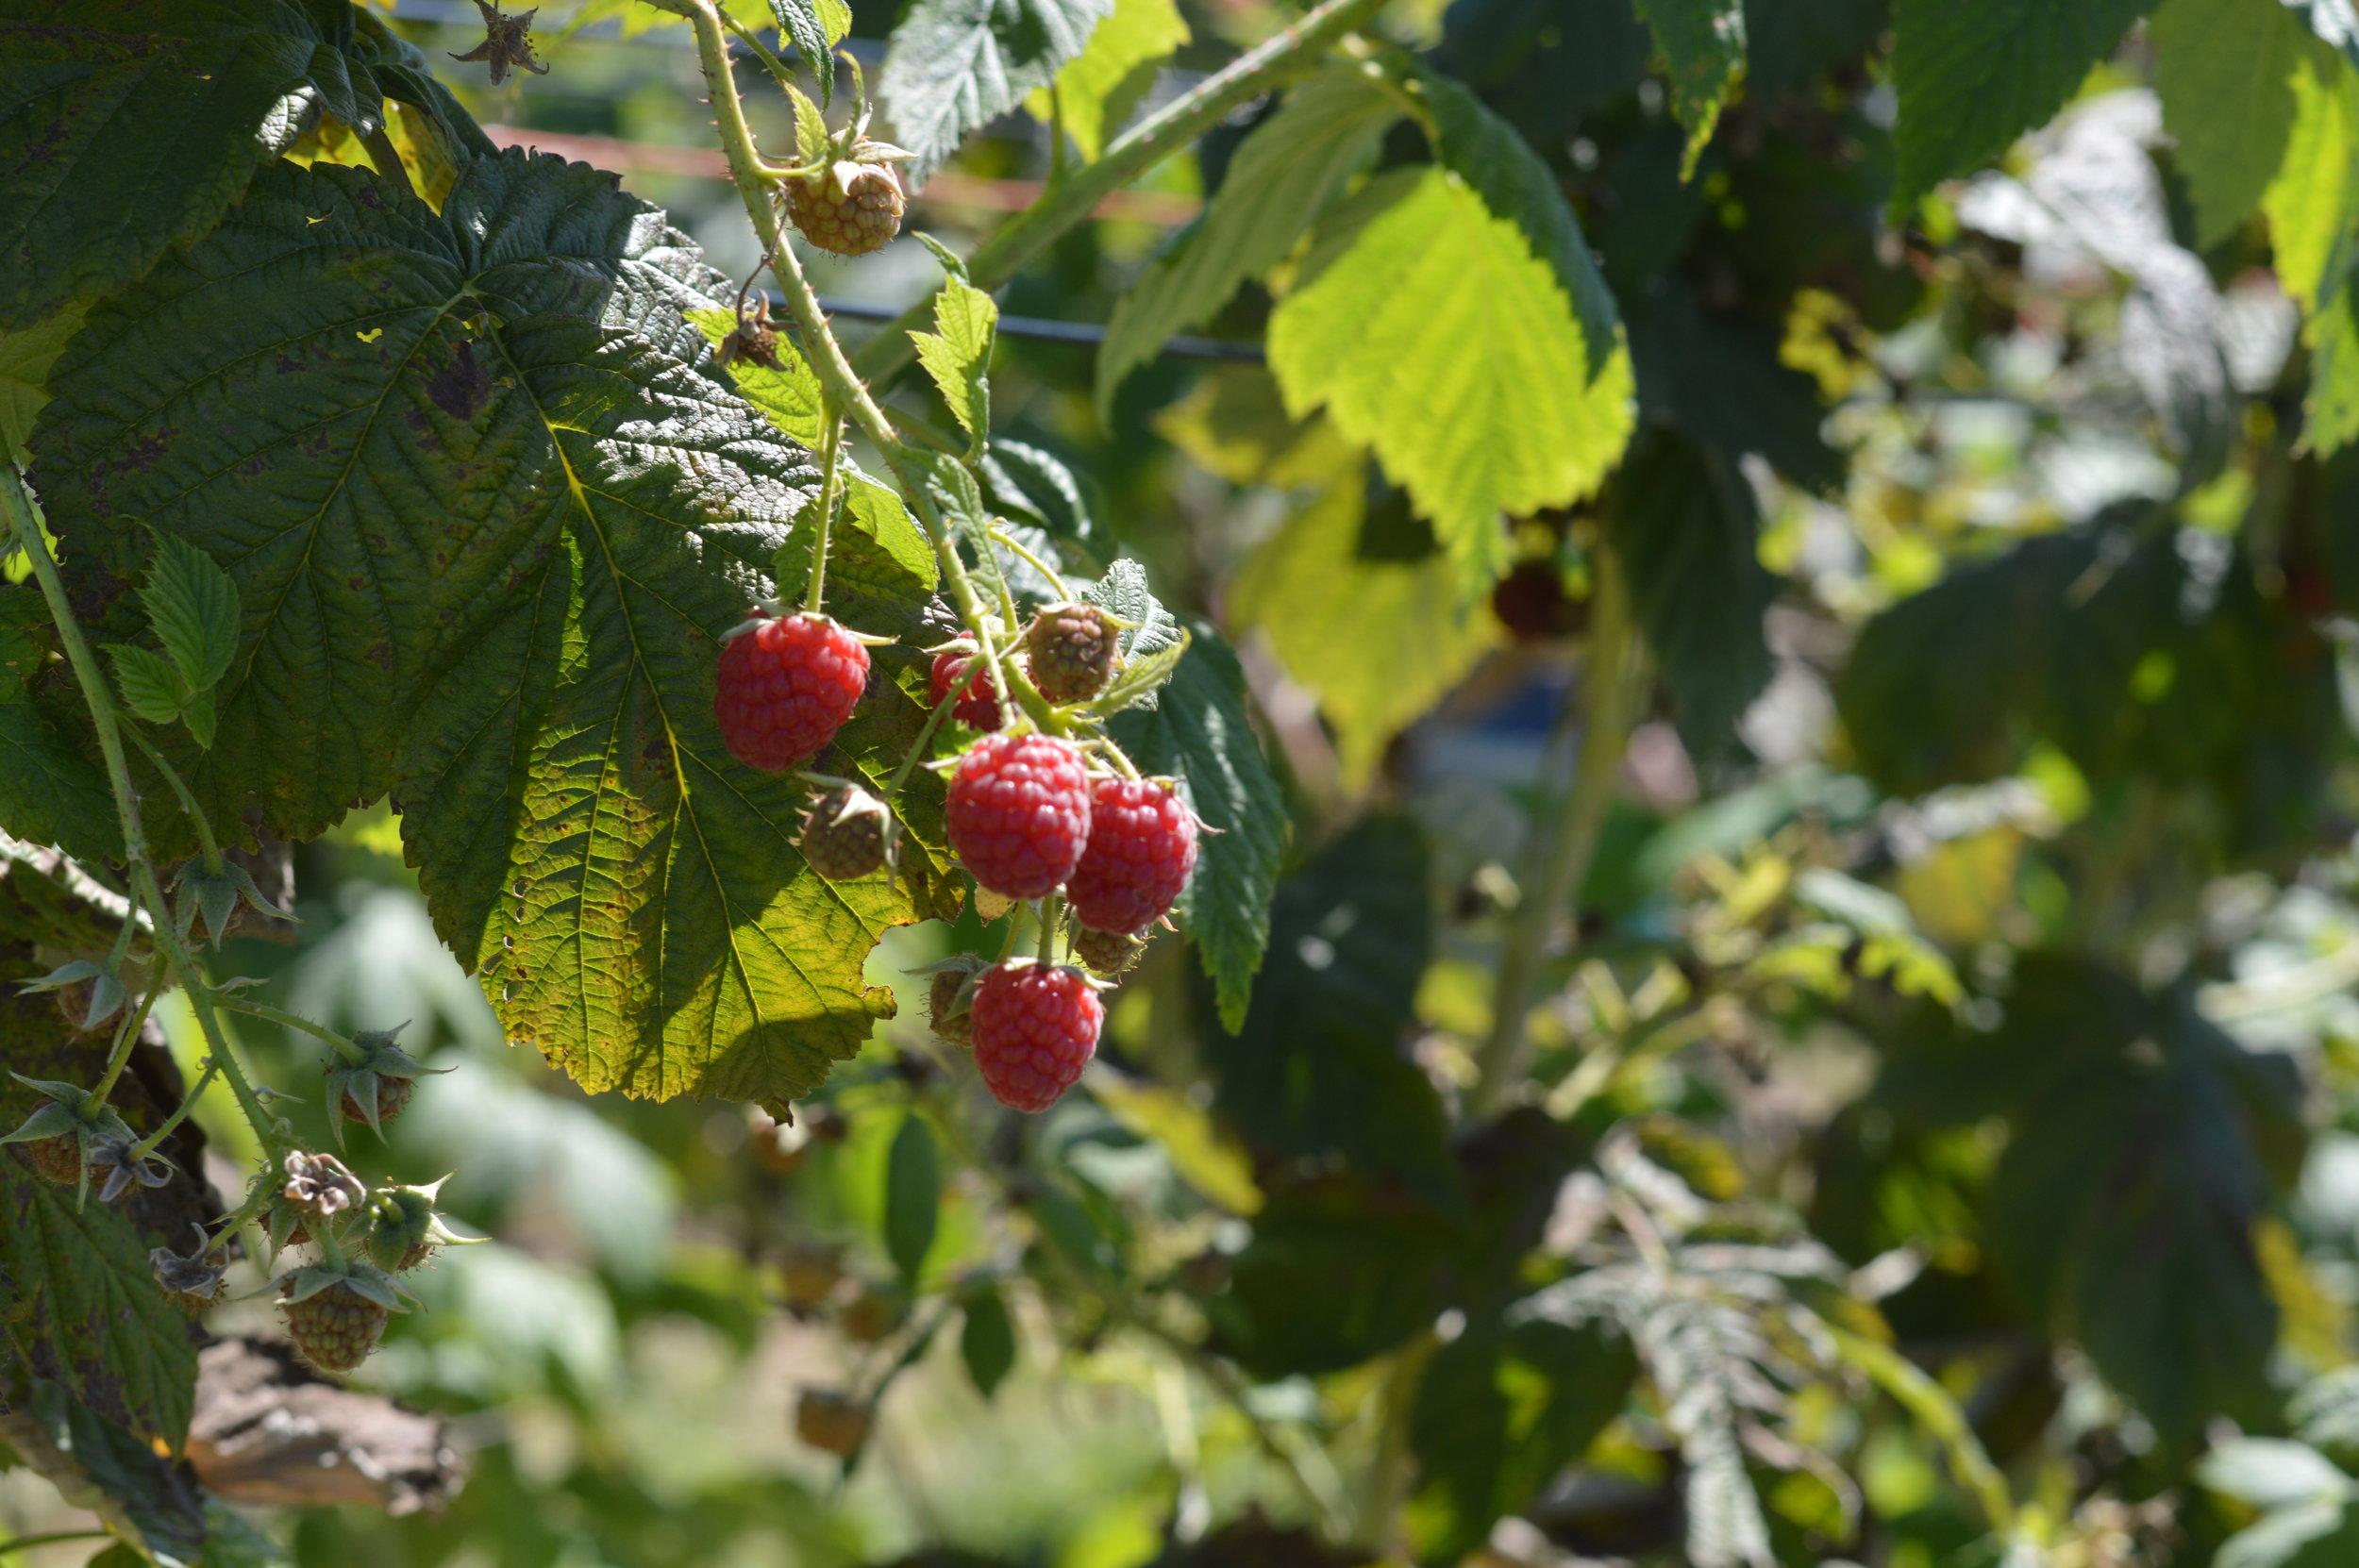 berry picking in michigan